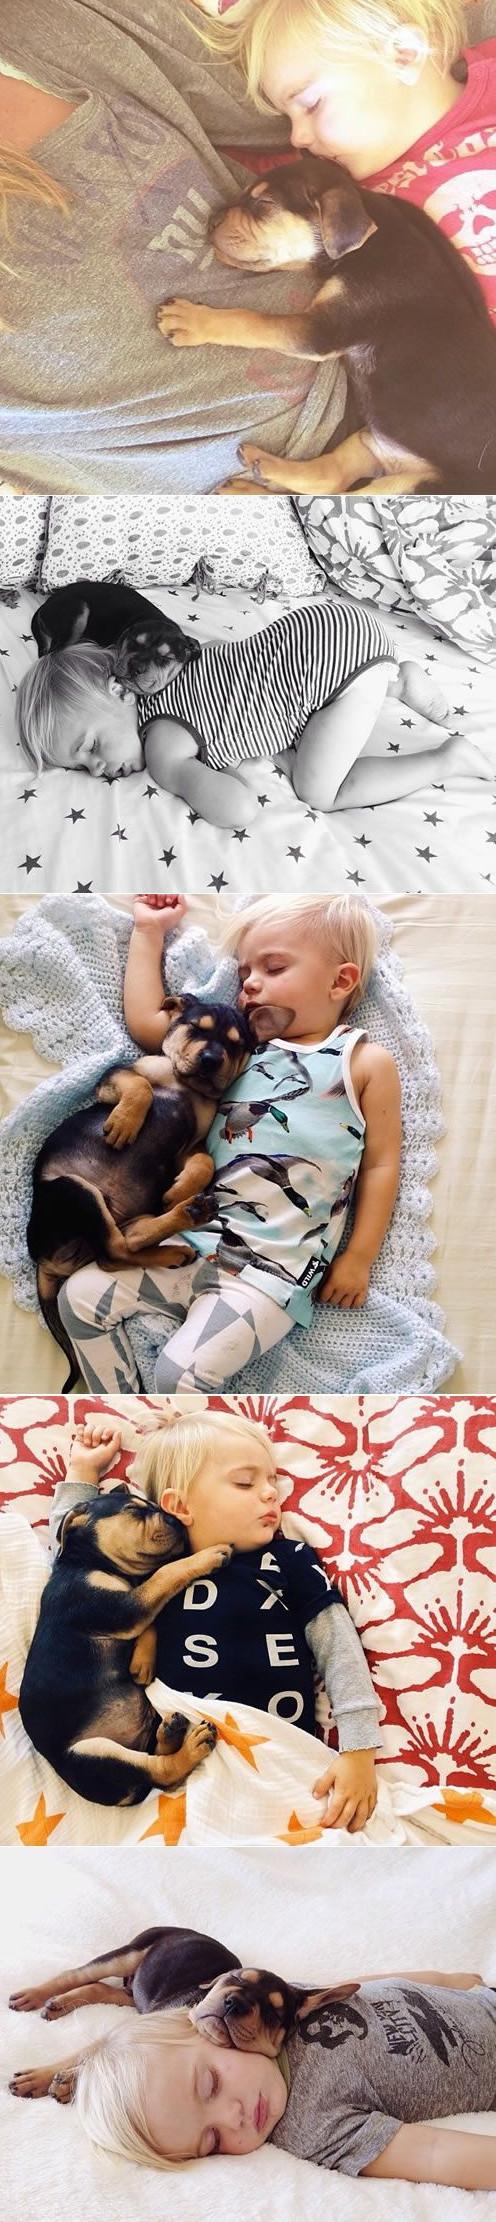 Собака и ребенок спят